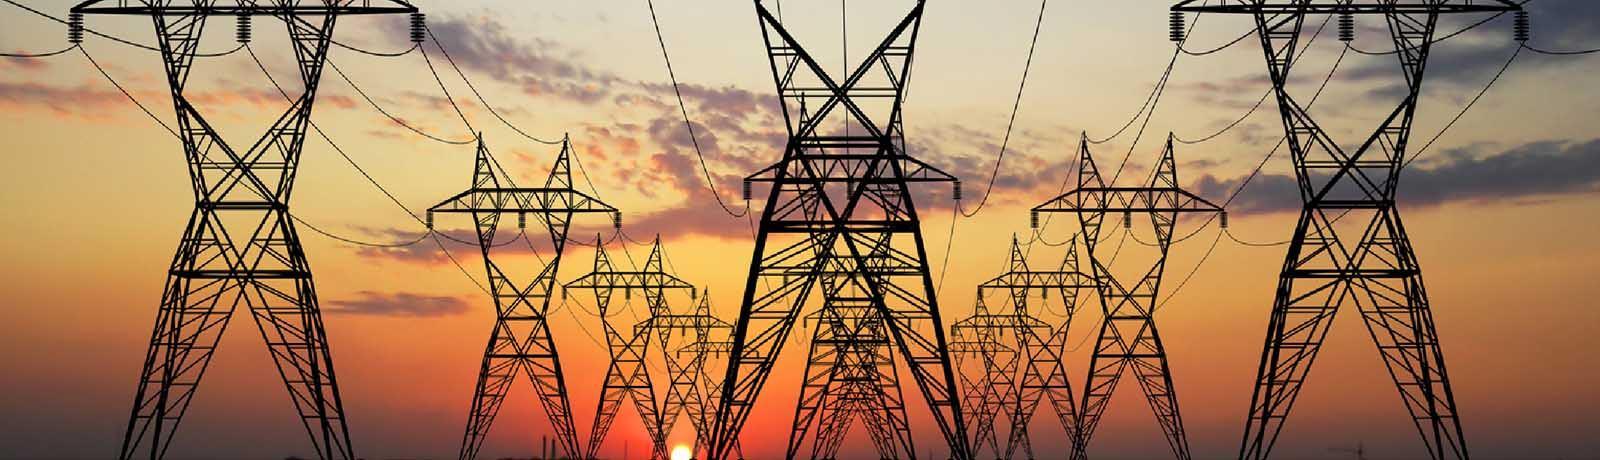 Energy & Utilities Industry Solutions